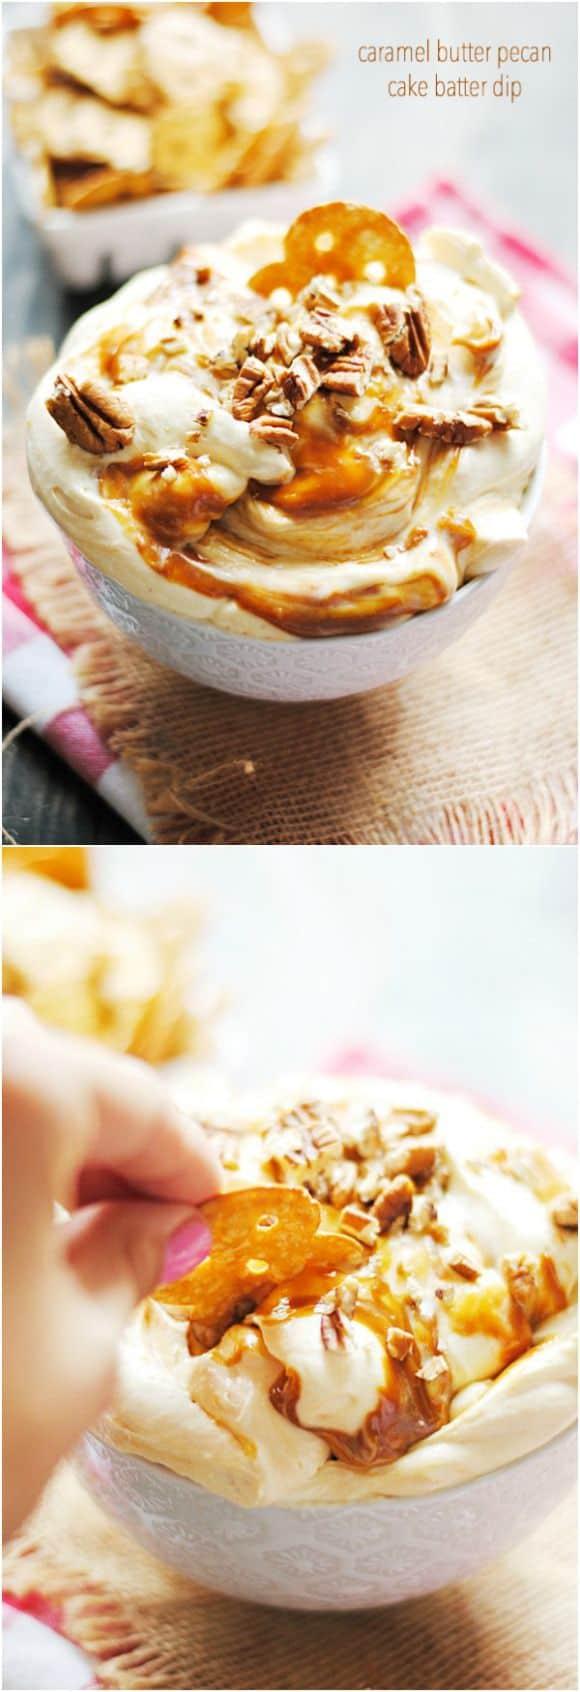 Caramel Butter Pecan Cake Batter Dip